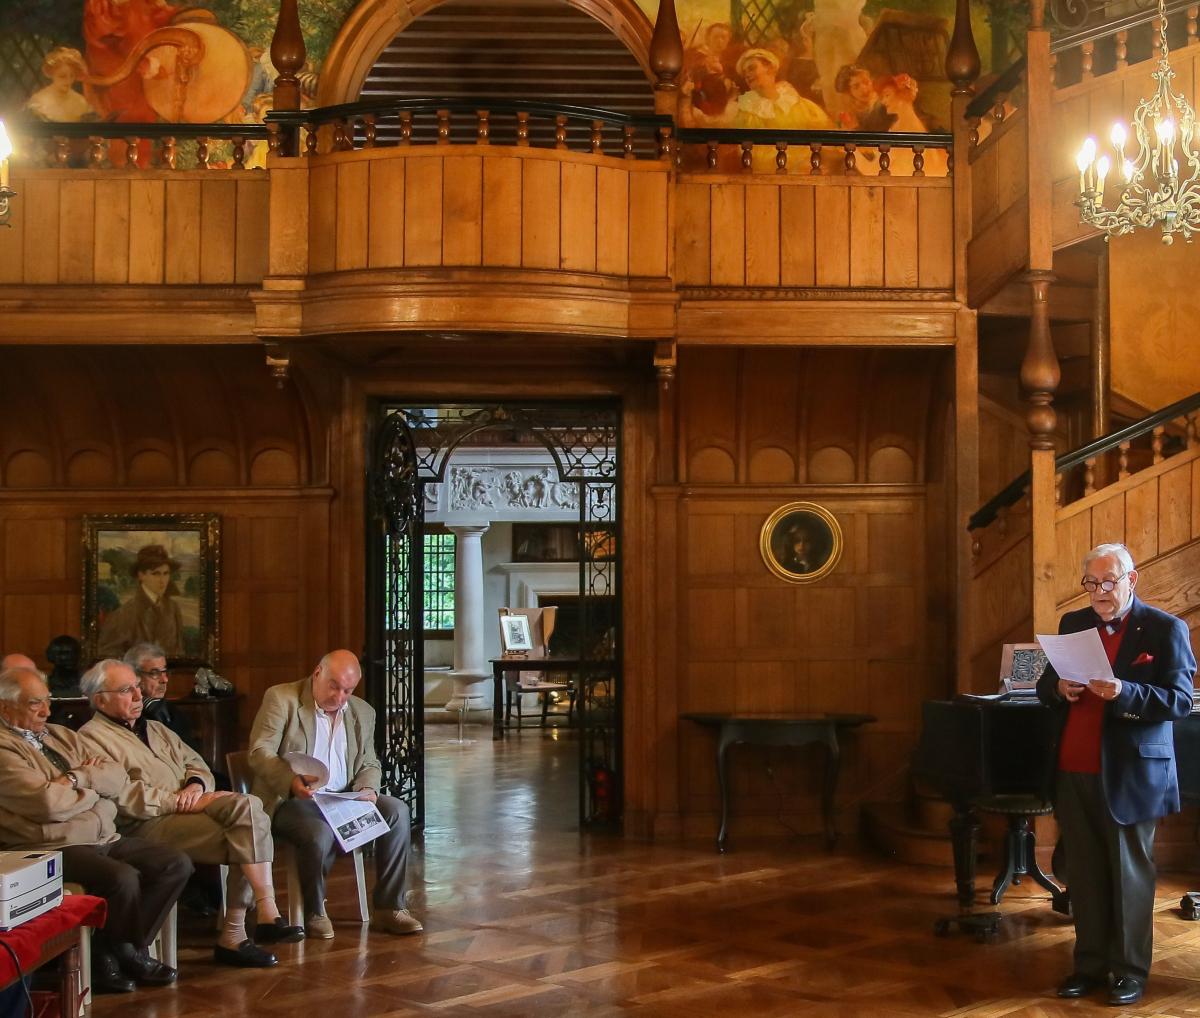 Arnaga ce samedi à 18h : Edmond Rostand, Léon Bonnat et l'Alliance franco-russe